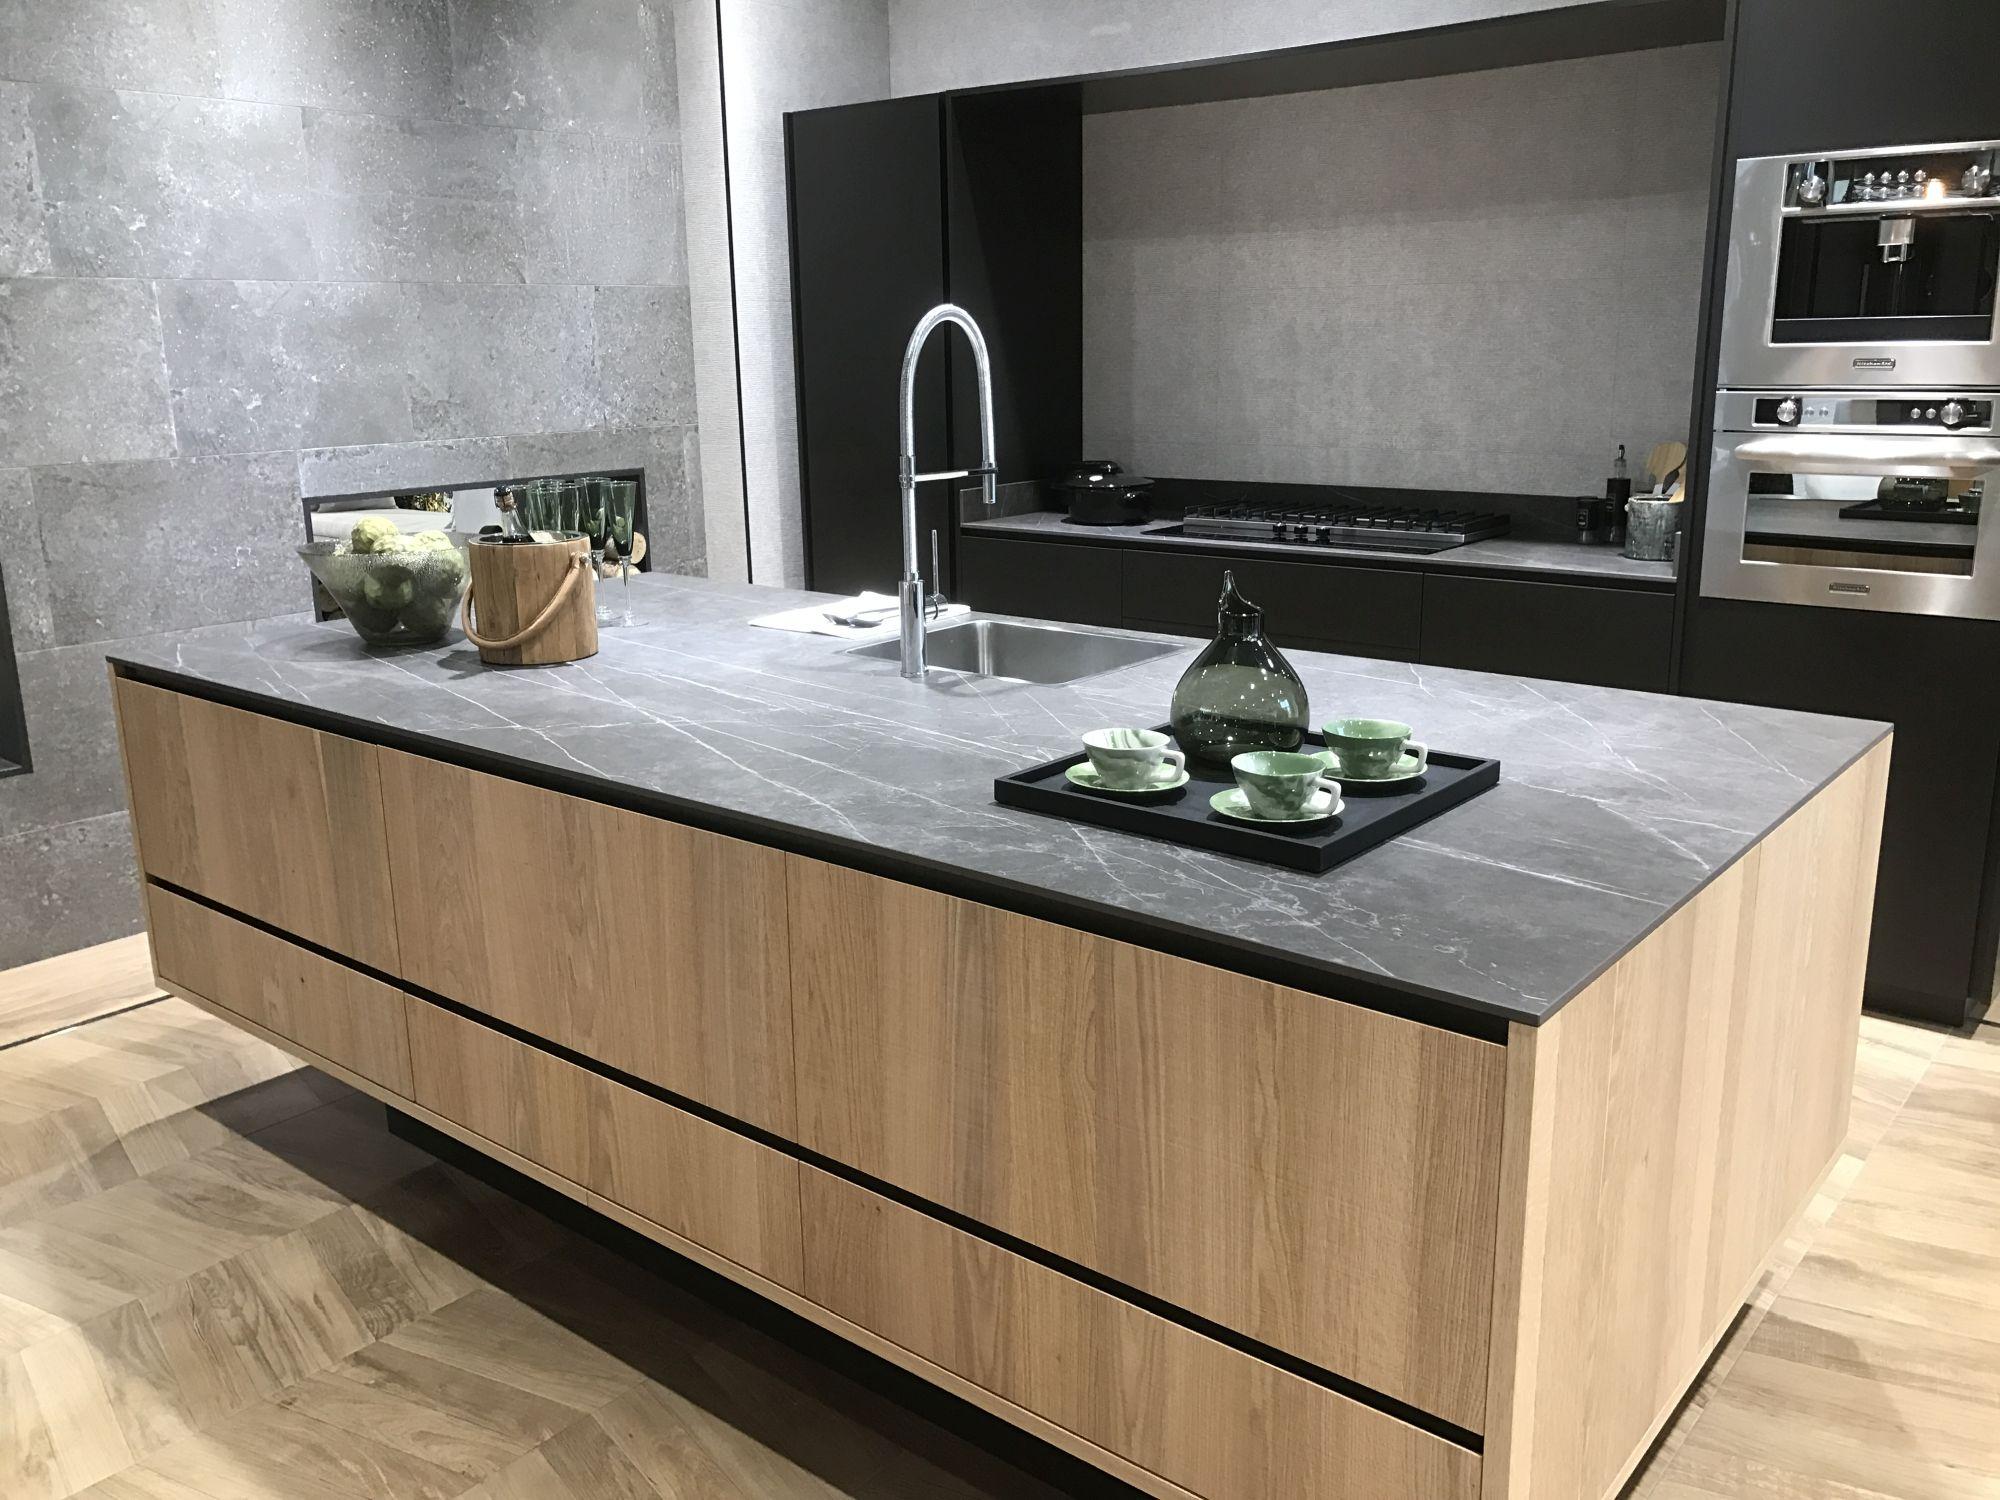 Modern-kitchen-with-parquet-inspired-ceramic-floor-tiles-by-Porcelanosa